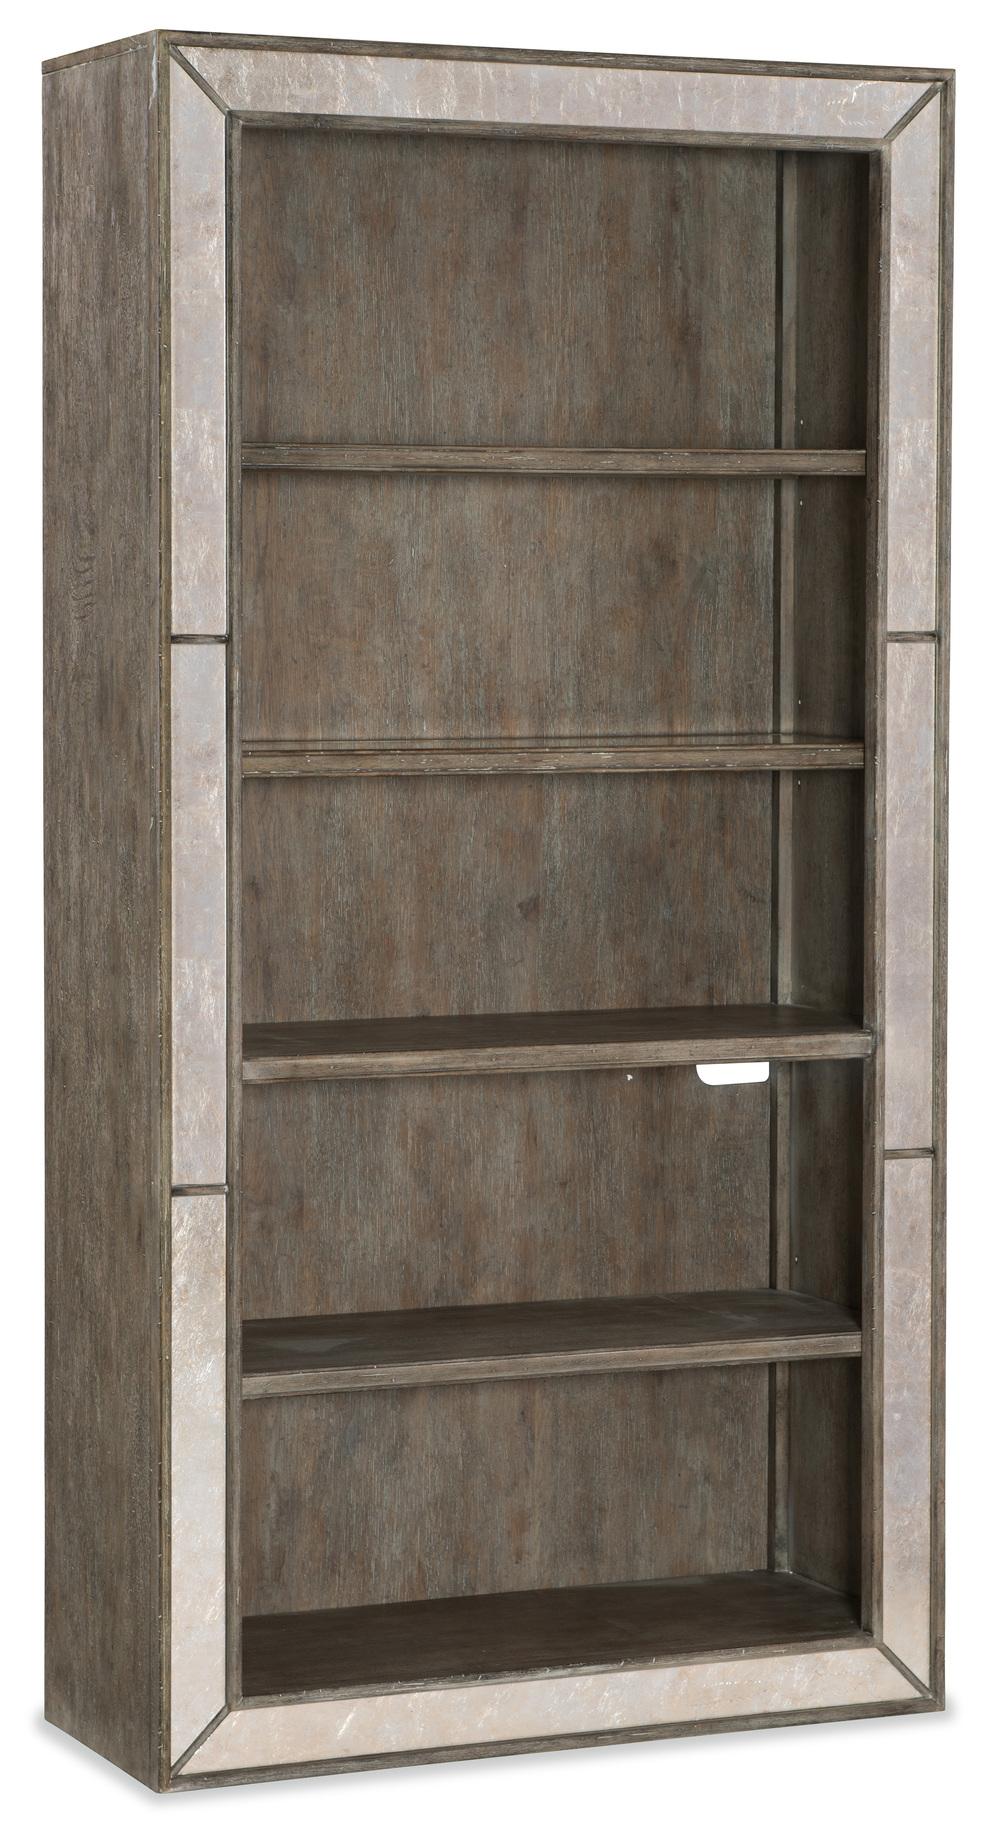 Hooker Furniture - Rustic Glam Bookcase